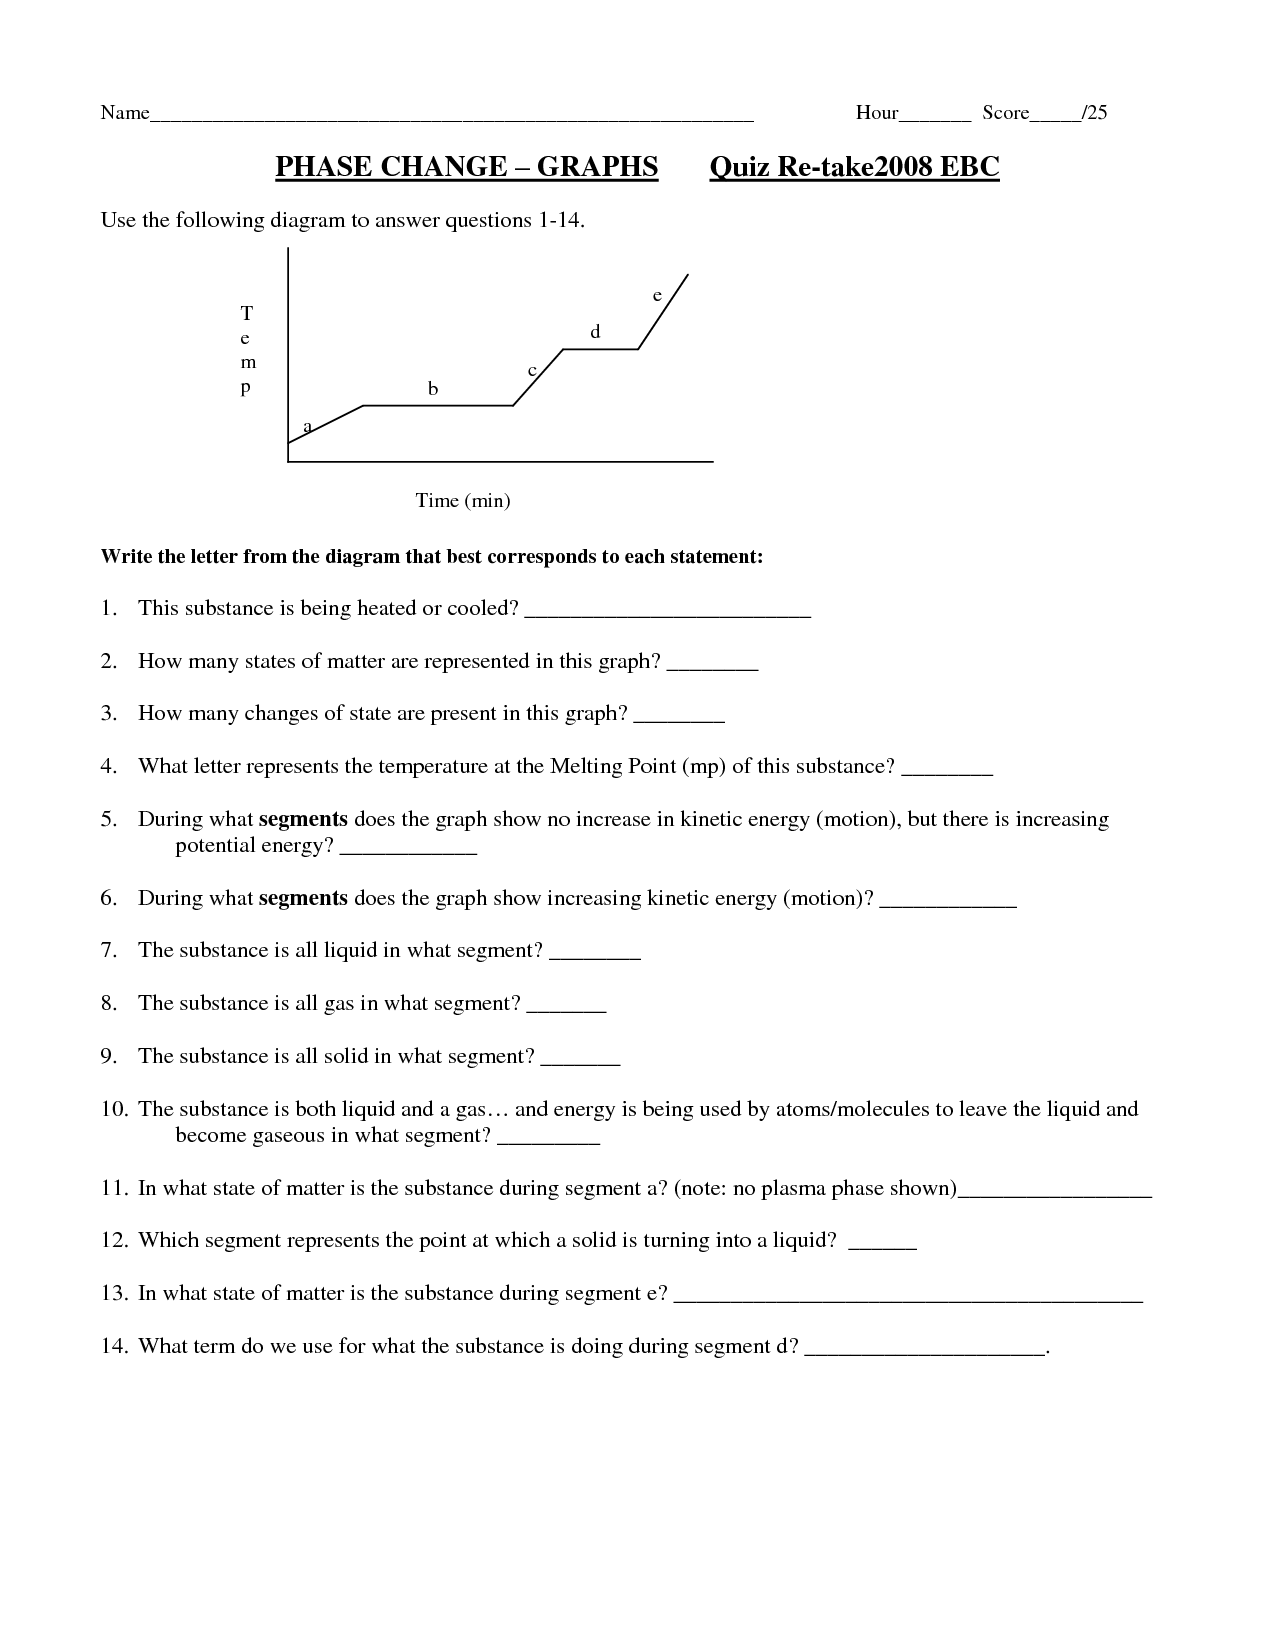 Phase Change Diagram Worksheet Chemistry